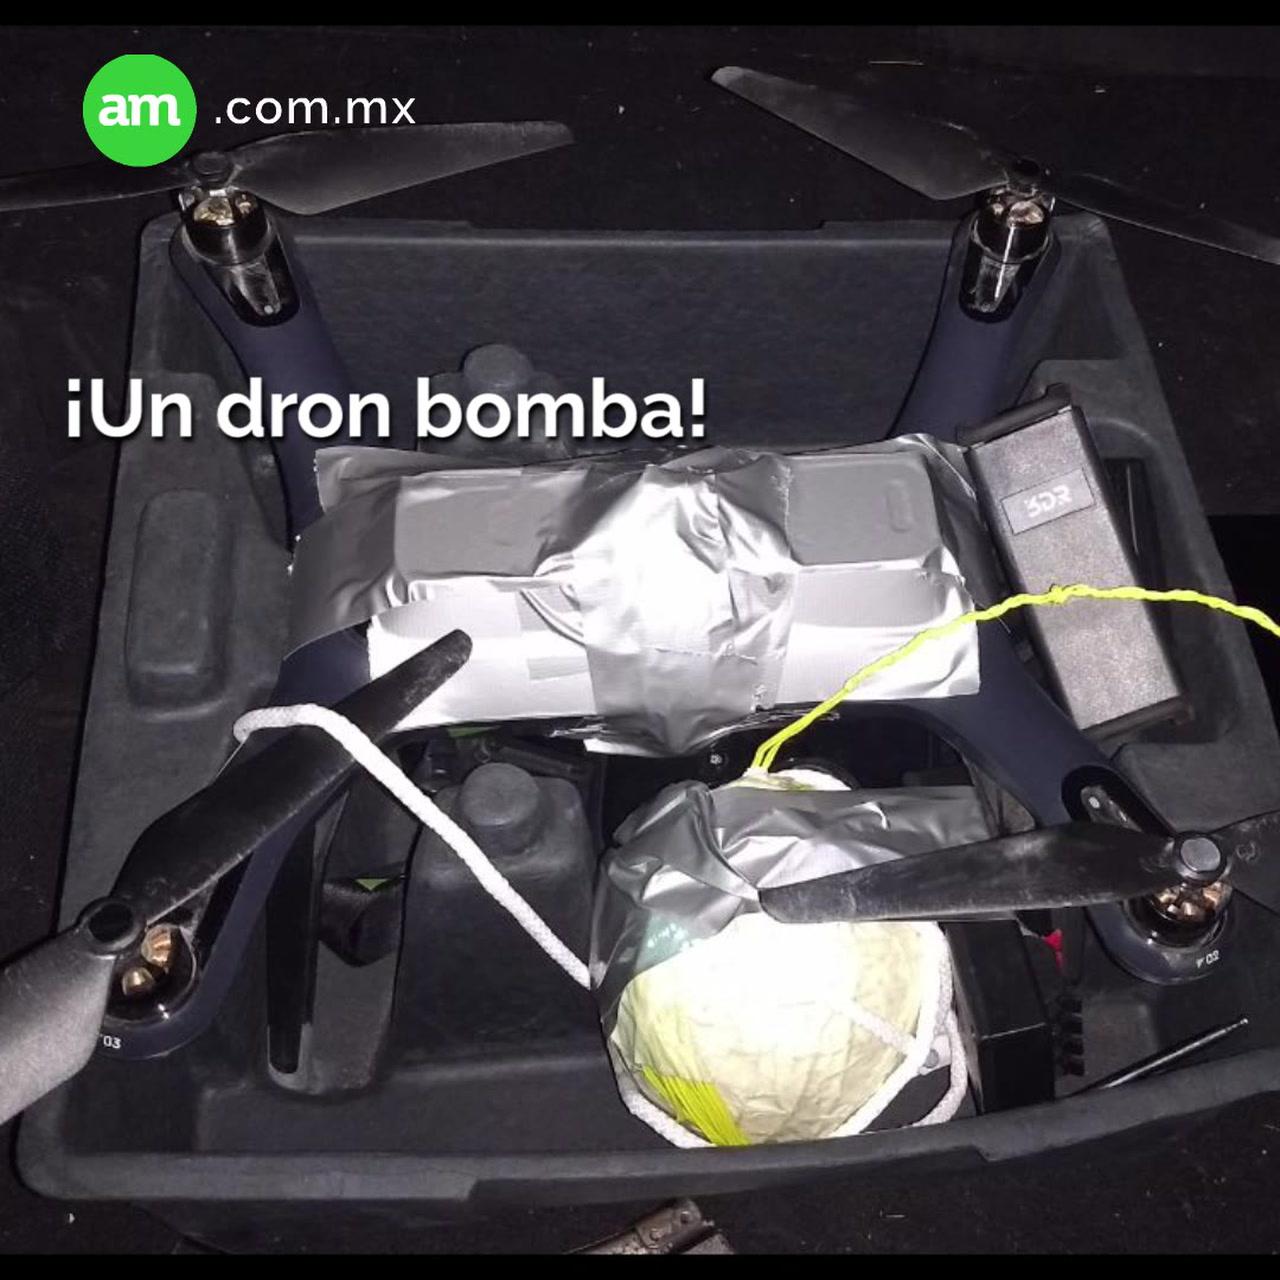 Decomisan ¡dron bomba!